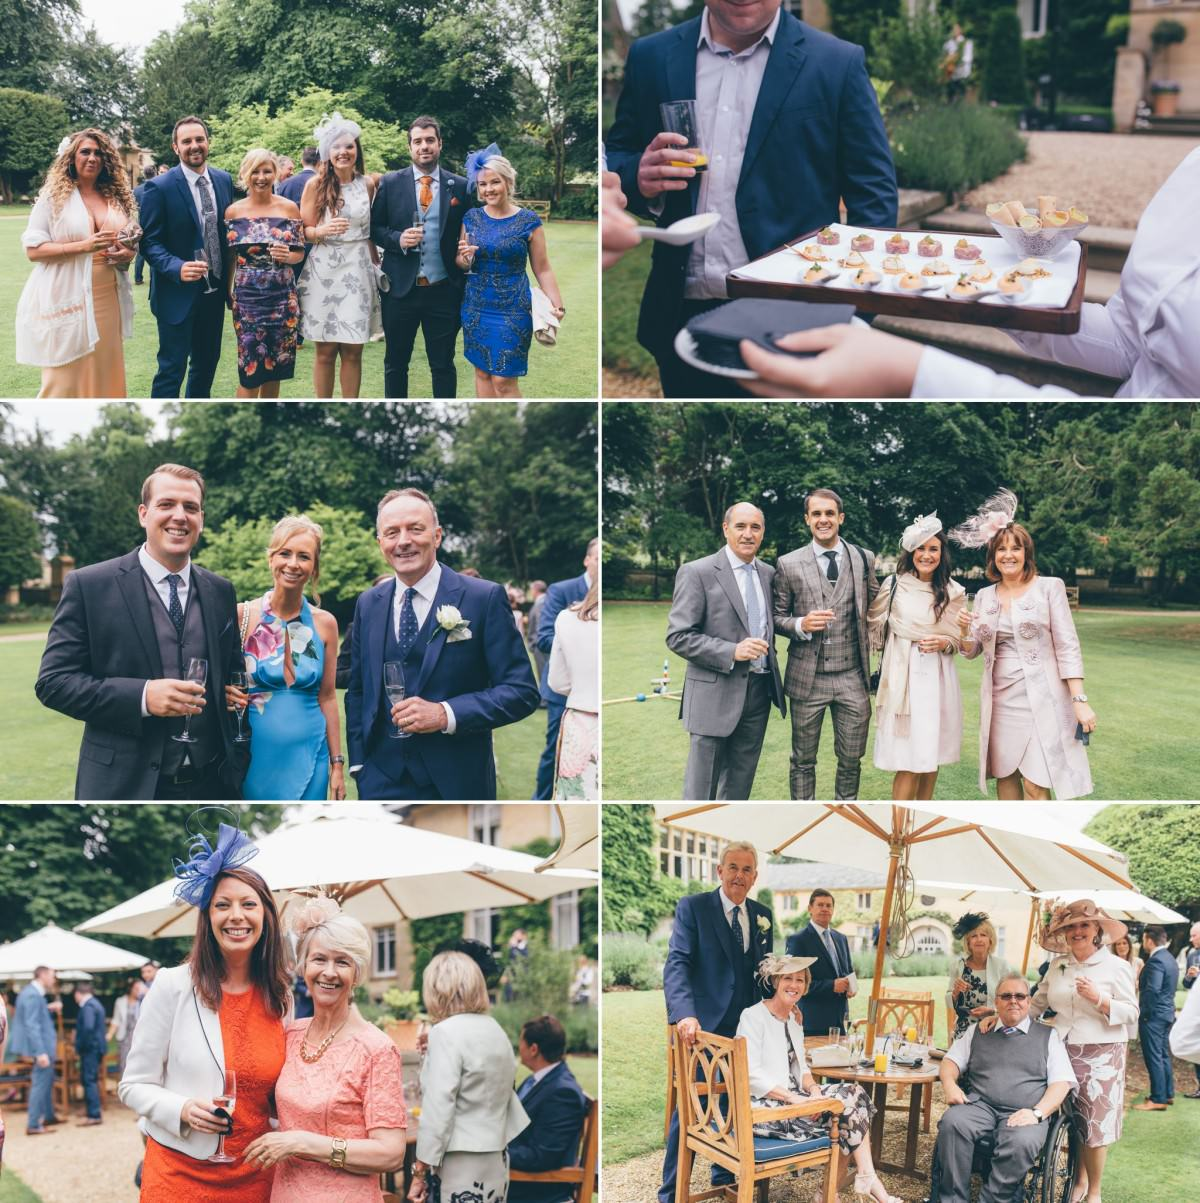 welsh_wedding_photographer_rachel_lambert_photography_lower_slaughter_manor_house_cotswolds_harriet_dean_ 55